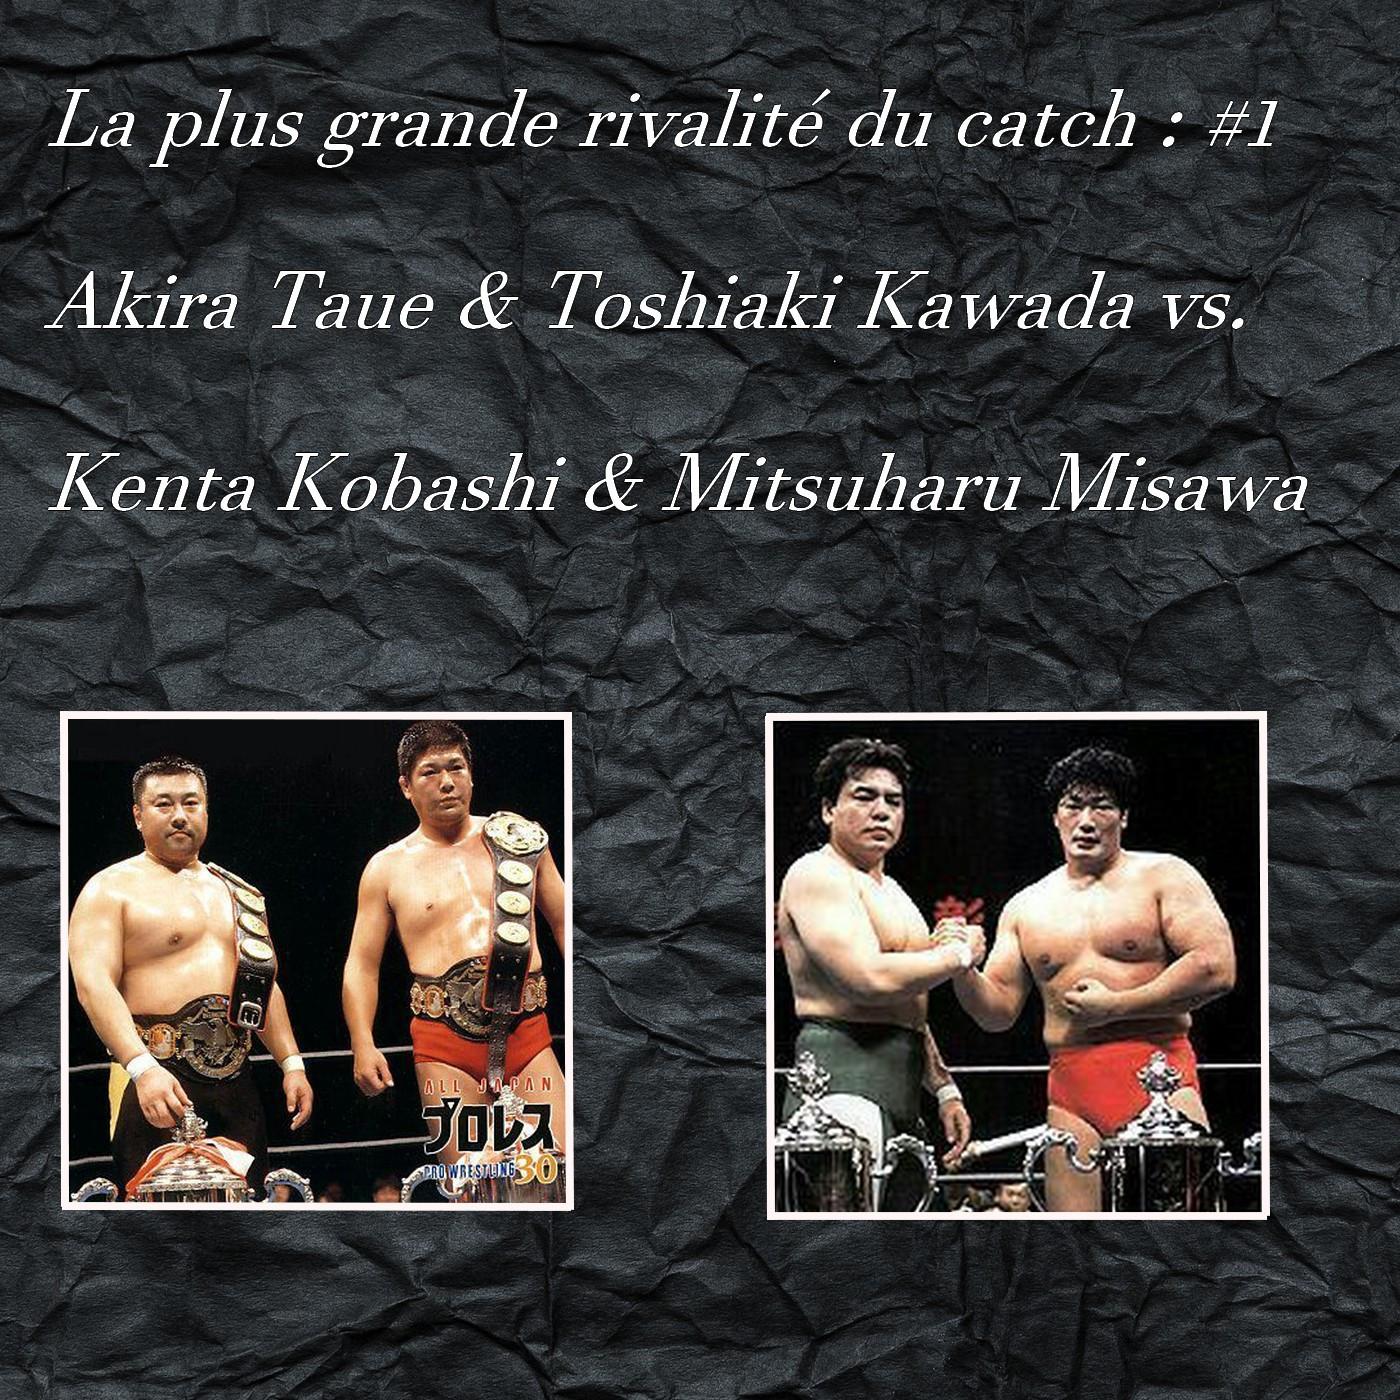 La plus grande rivalité du catch : KAWADA / TAUE VS MISAWA / KOBASHI